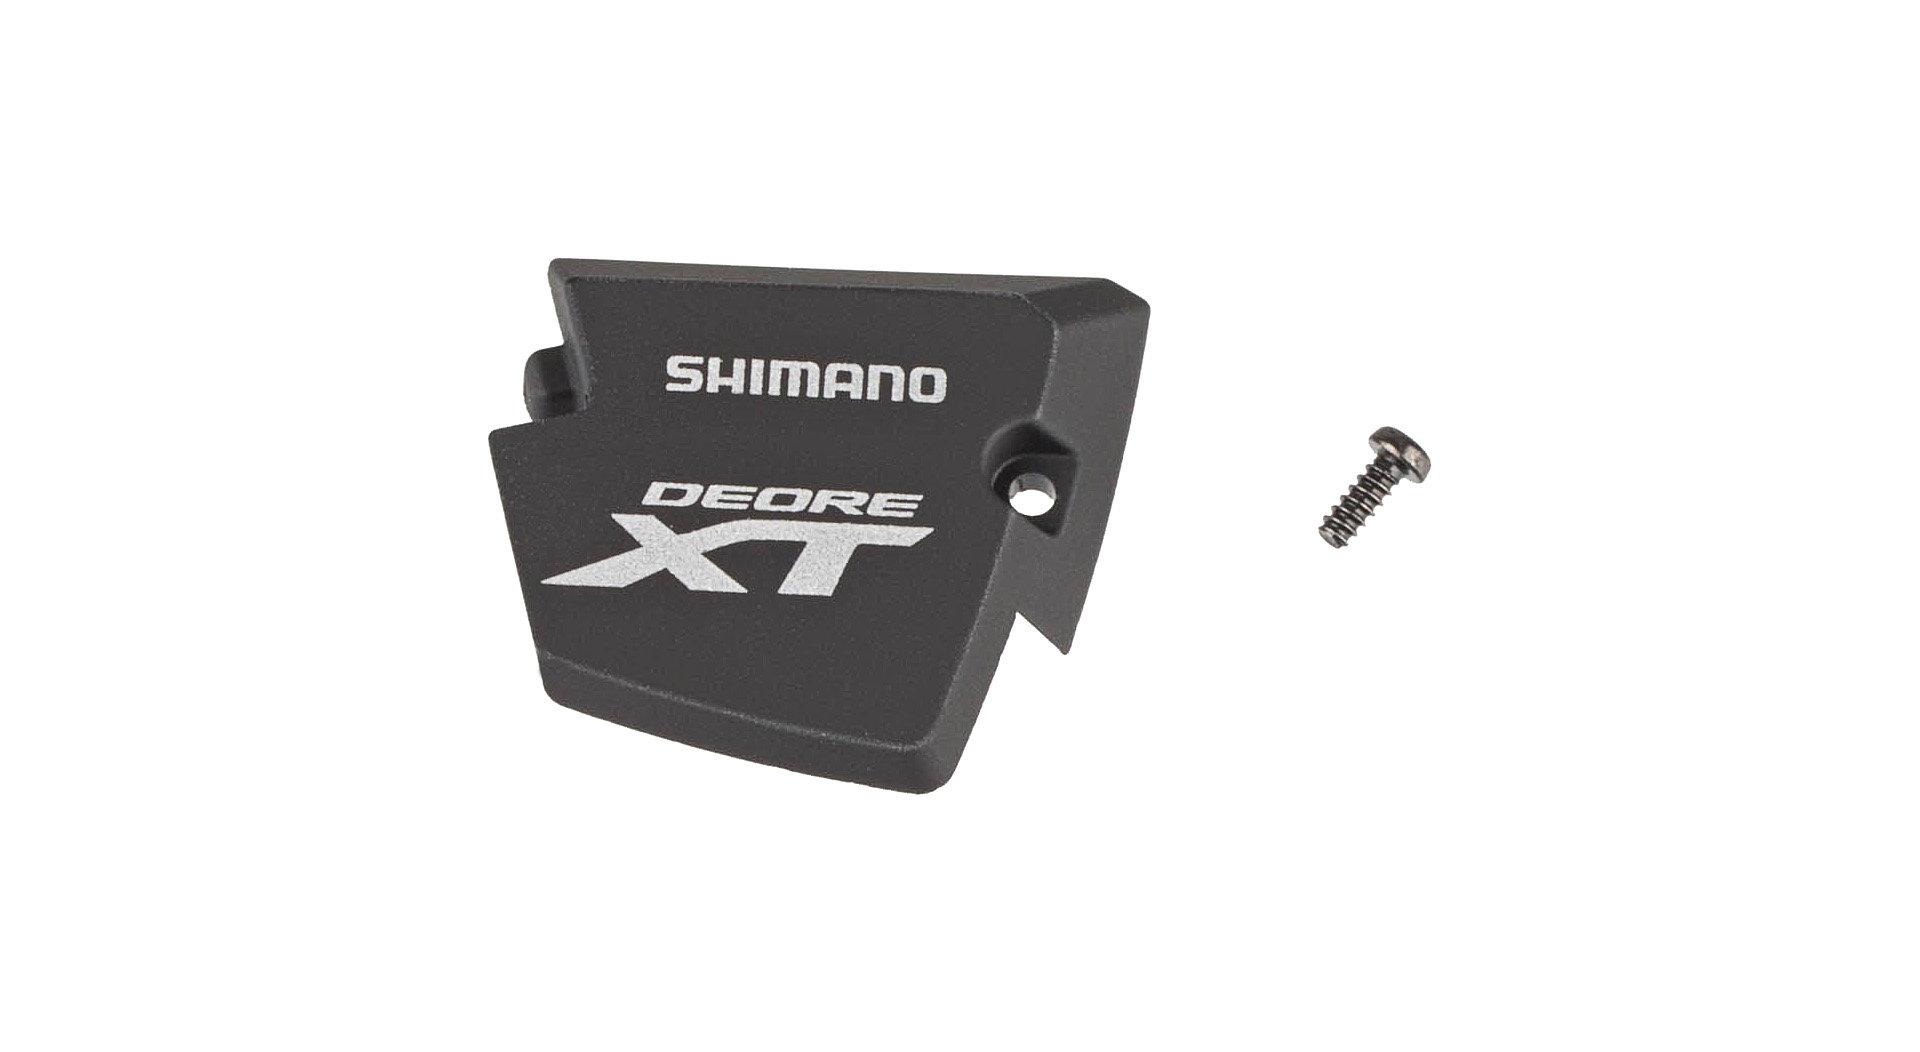 Krytka + šroubek řazení SHIMANO Deore XT SL-M8000 - levé